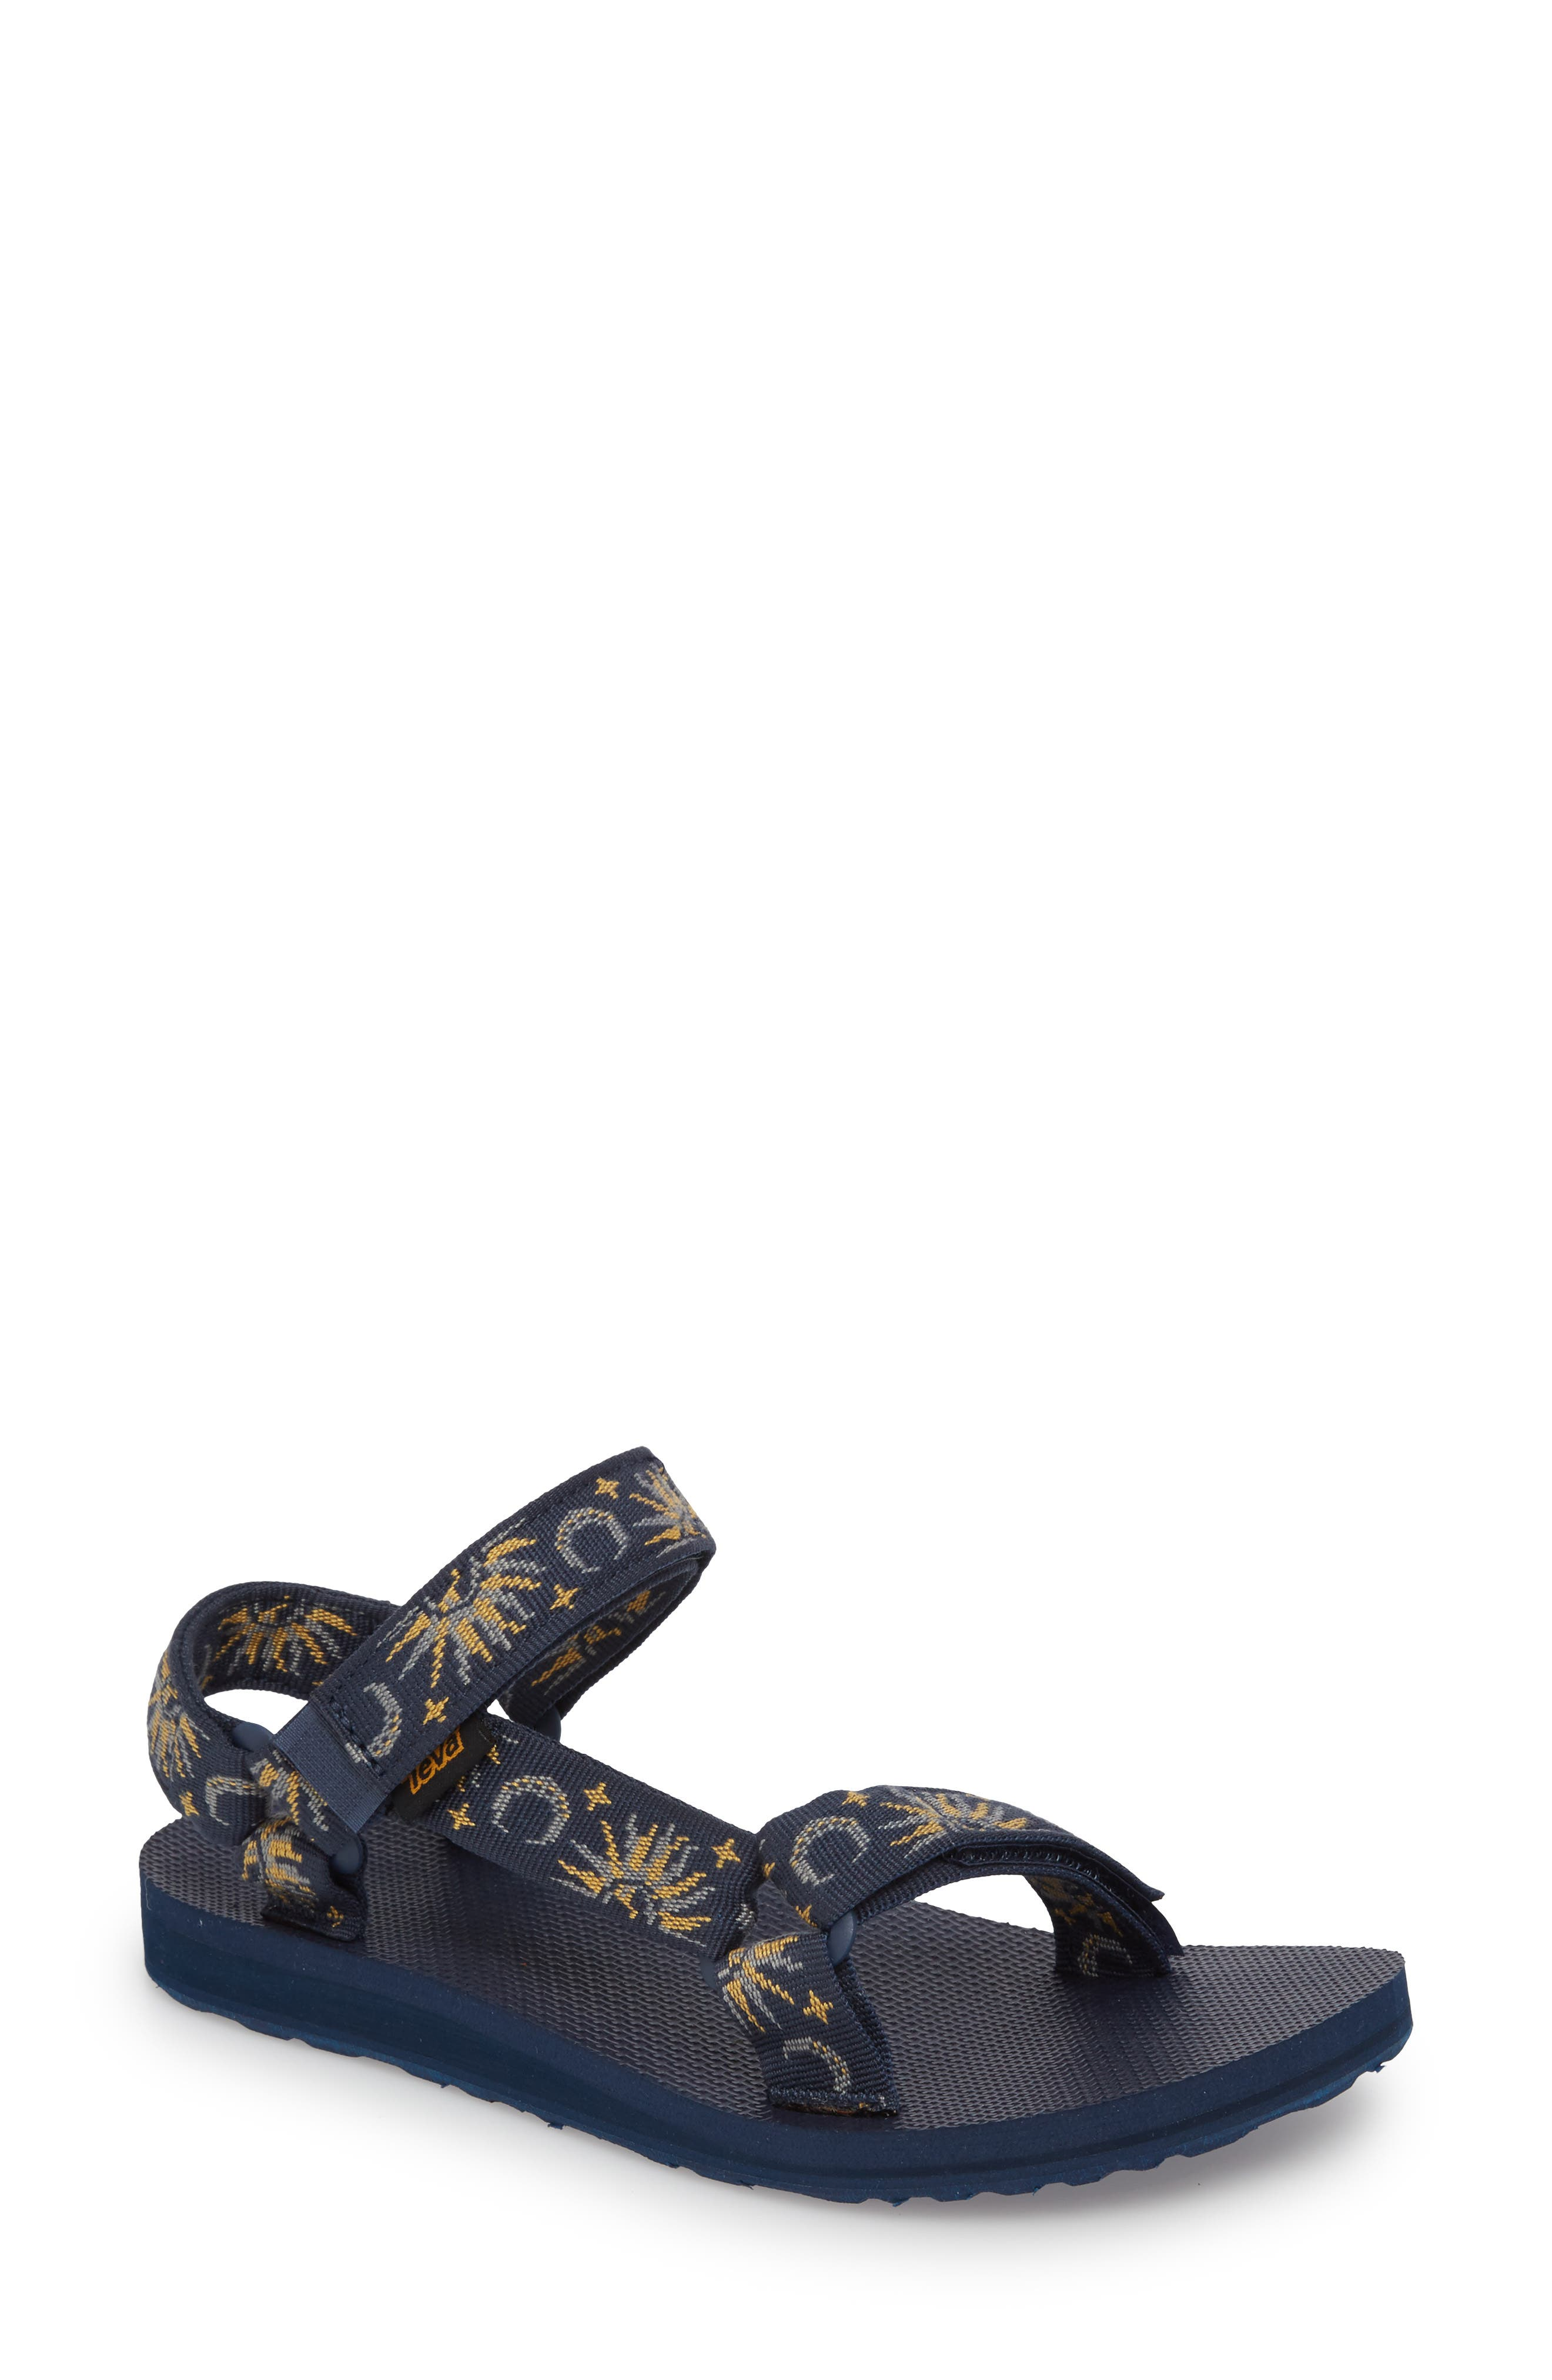 TEVA 'Original Universal' Sandal, Sun And Moon Insignia Blue